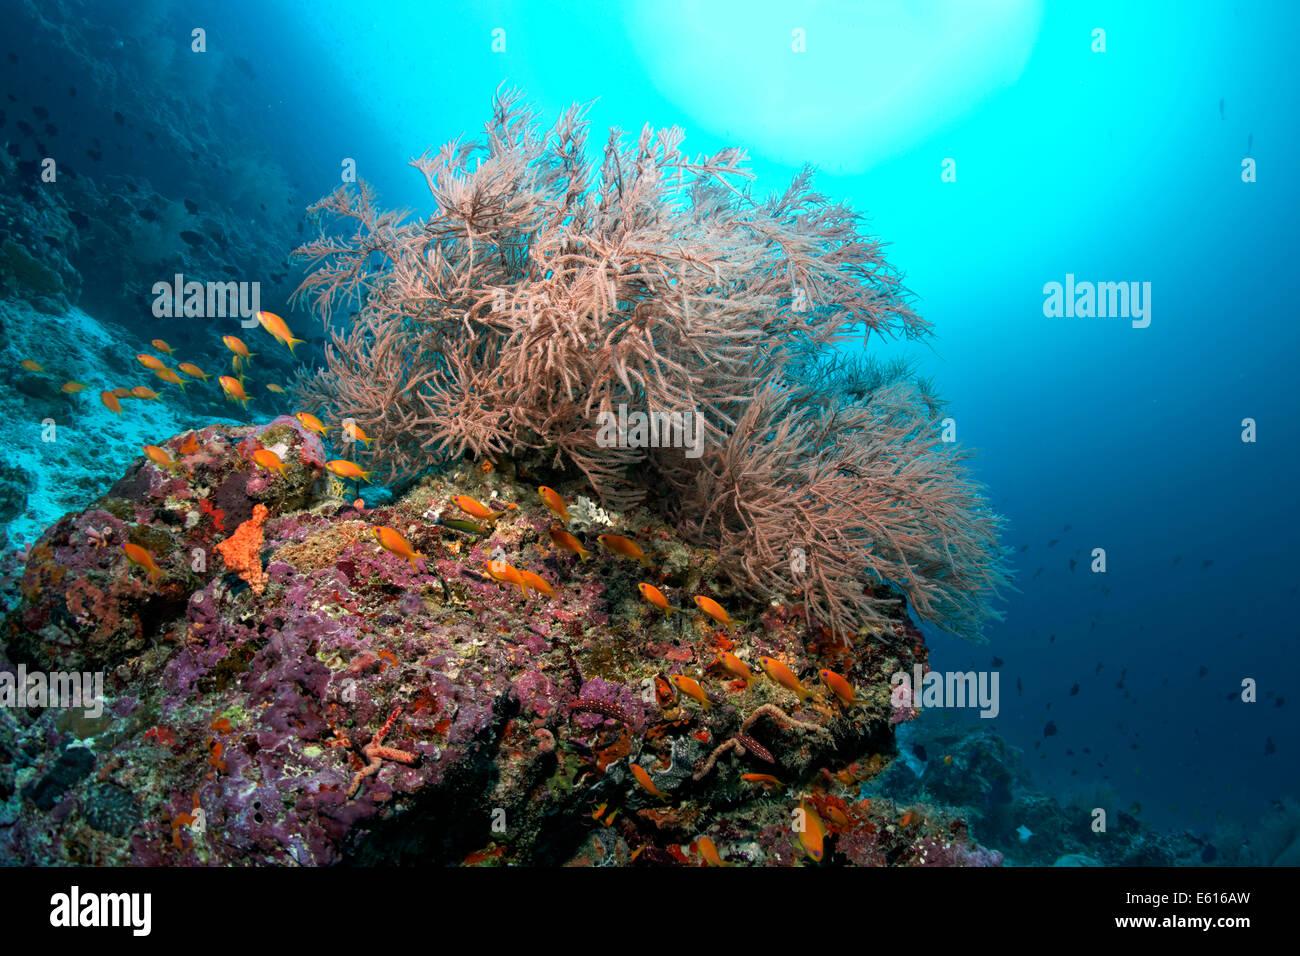 Coral reef with Black Coral (Antipathes sp.) and Anthias (Anthiinae), Lhaviyani Atoll, Indian Ocean, Maldives - Stock Image